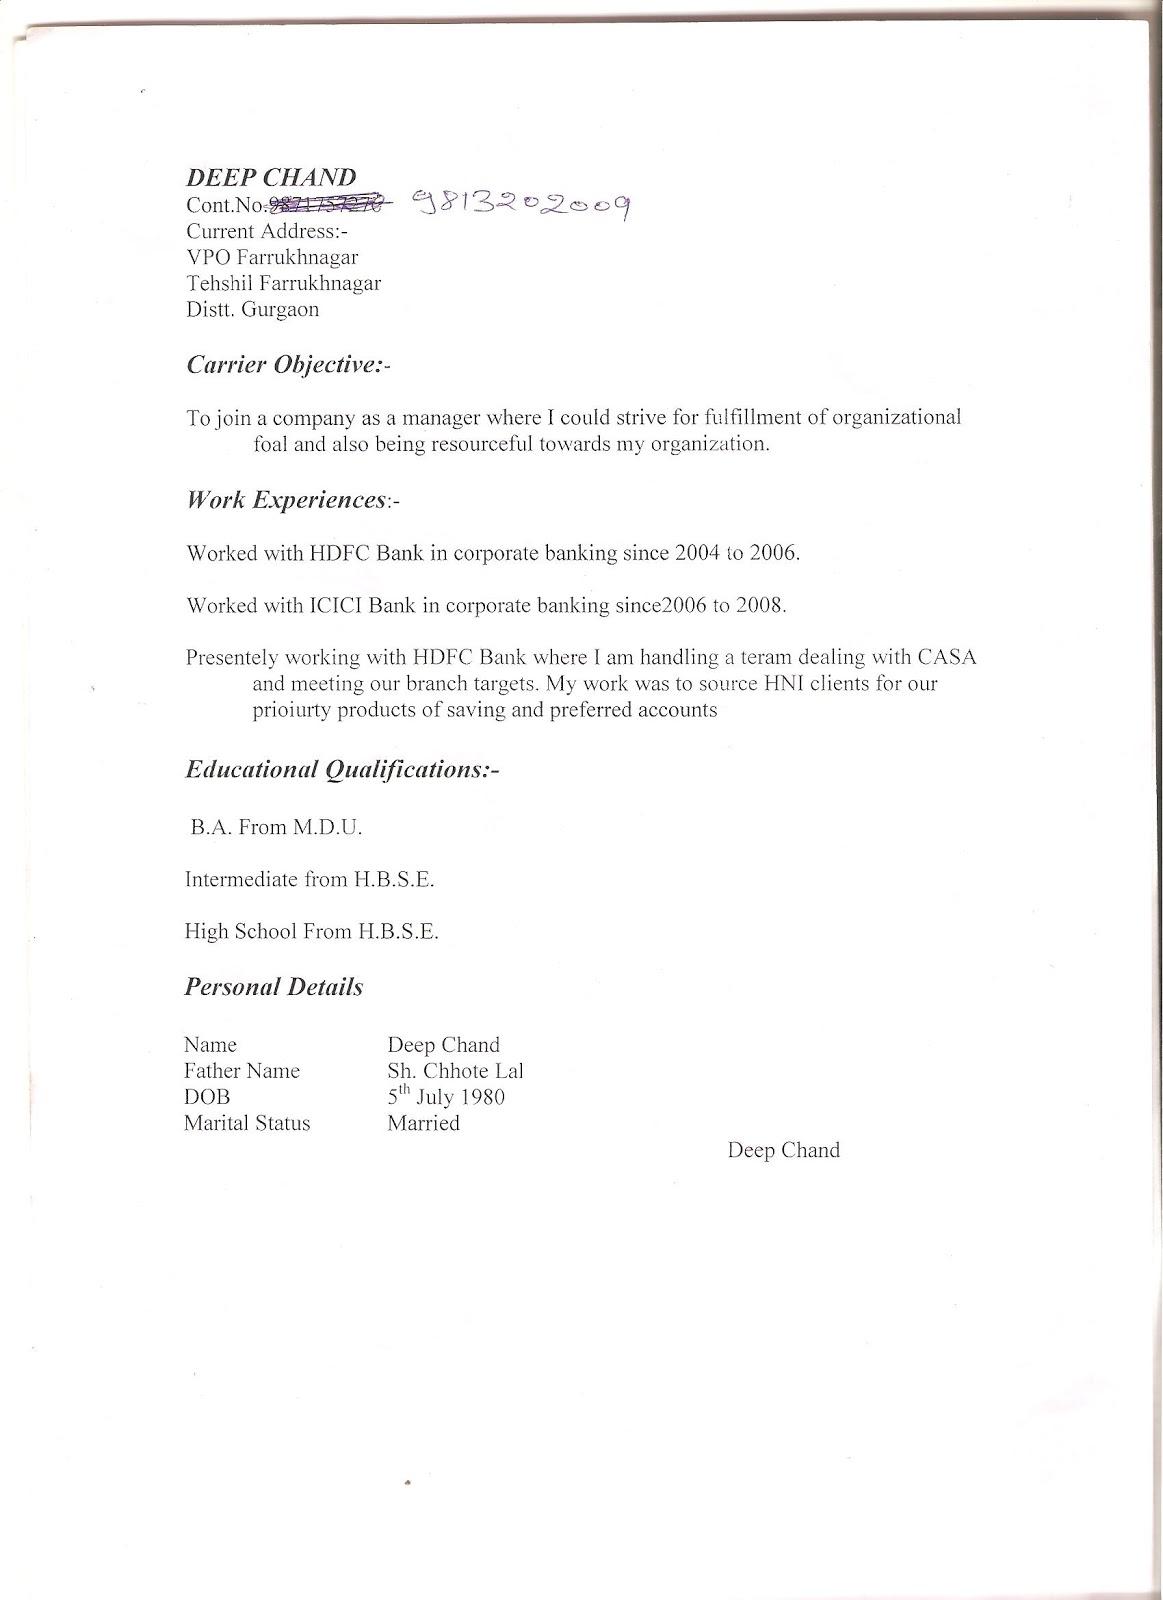 office boy resume sample free download